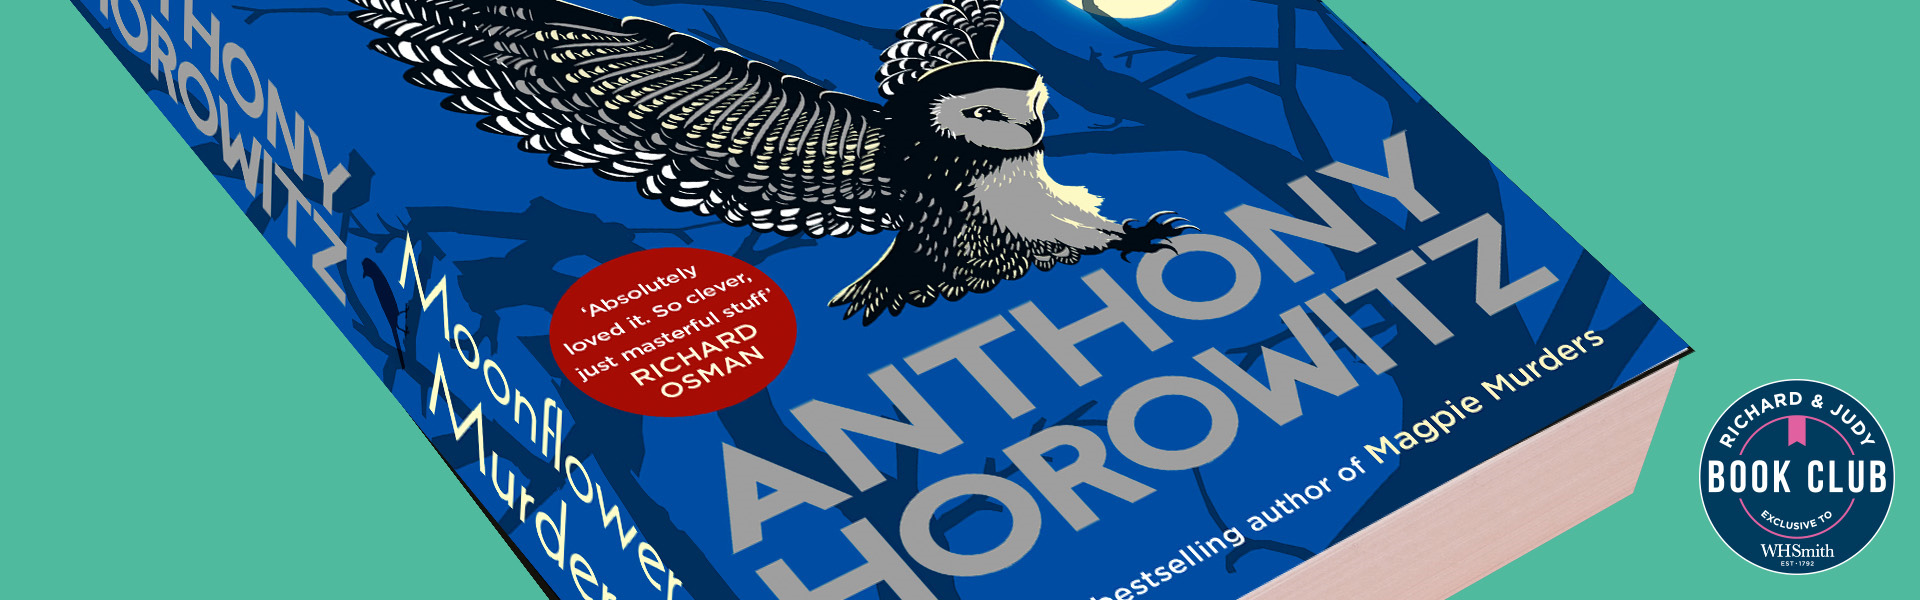 Richard & Judy Introduce Moonflower Murders by Anthony Horowitz